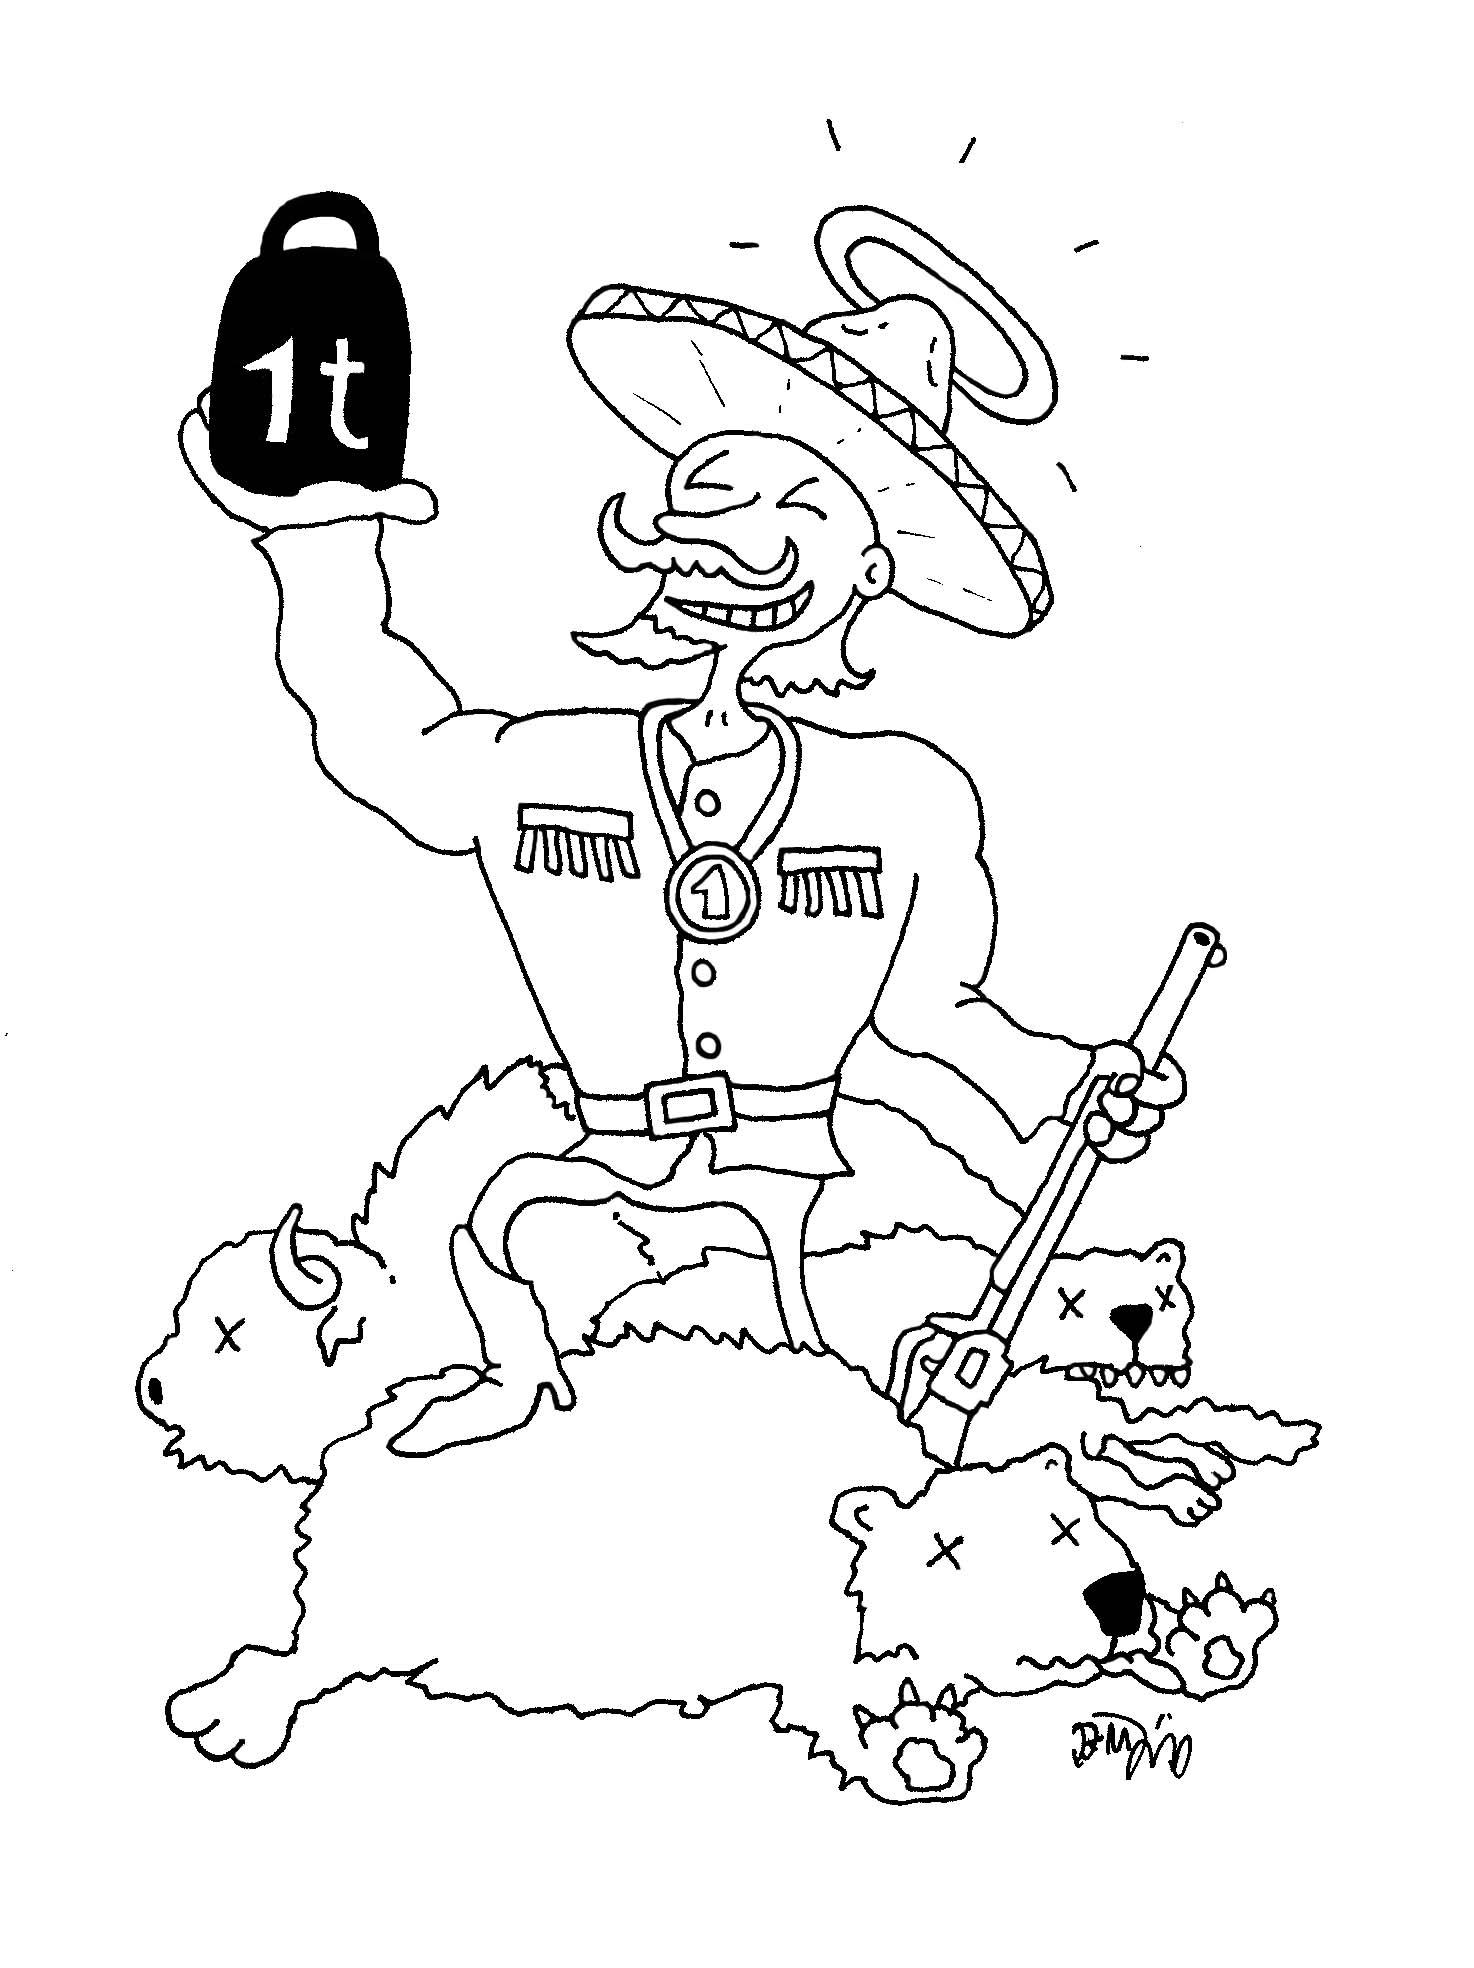 karl-may-illustration-mary-sue